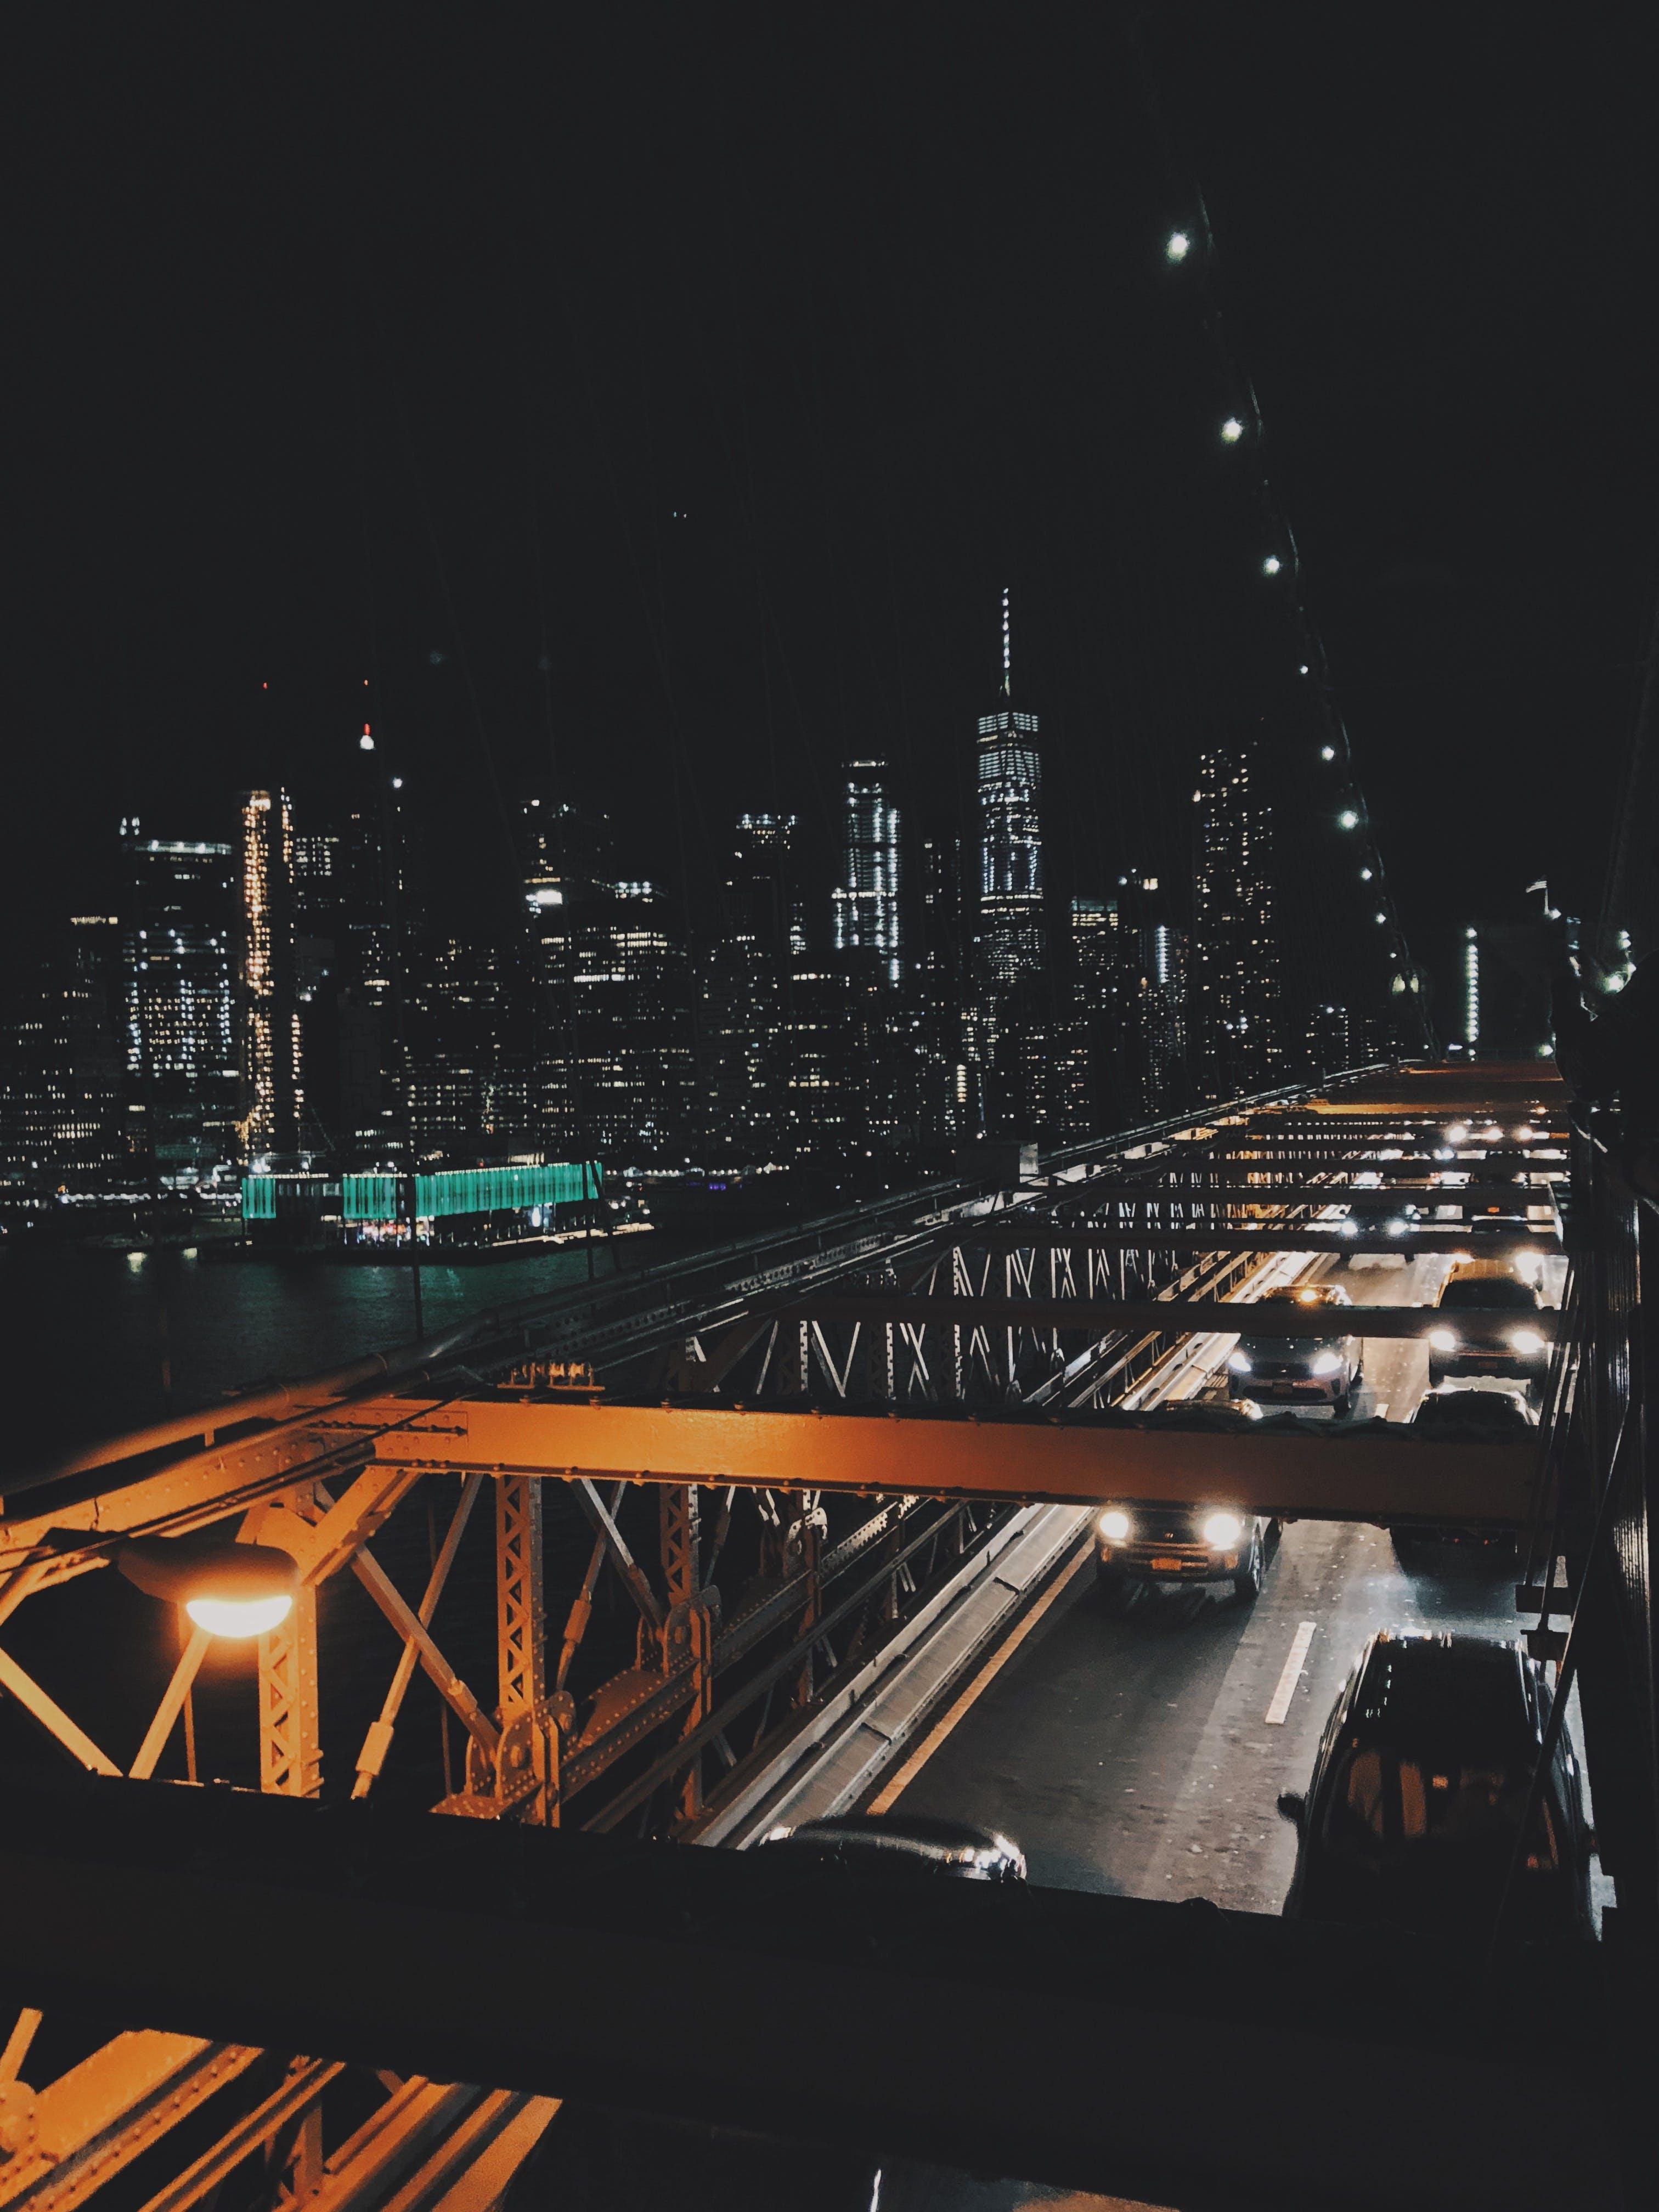 Vehicles on Bridge Under Black Sky